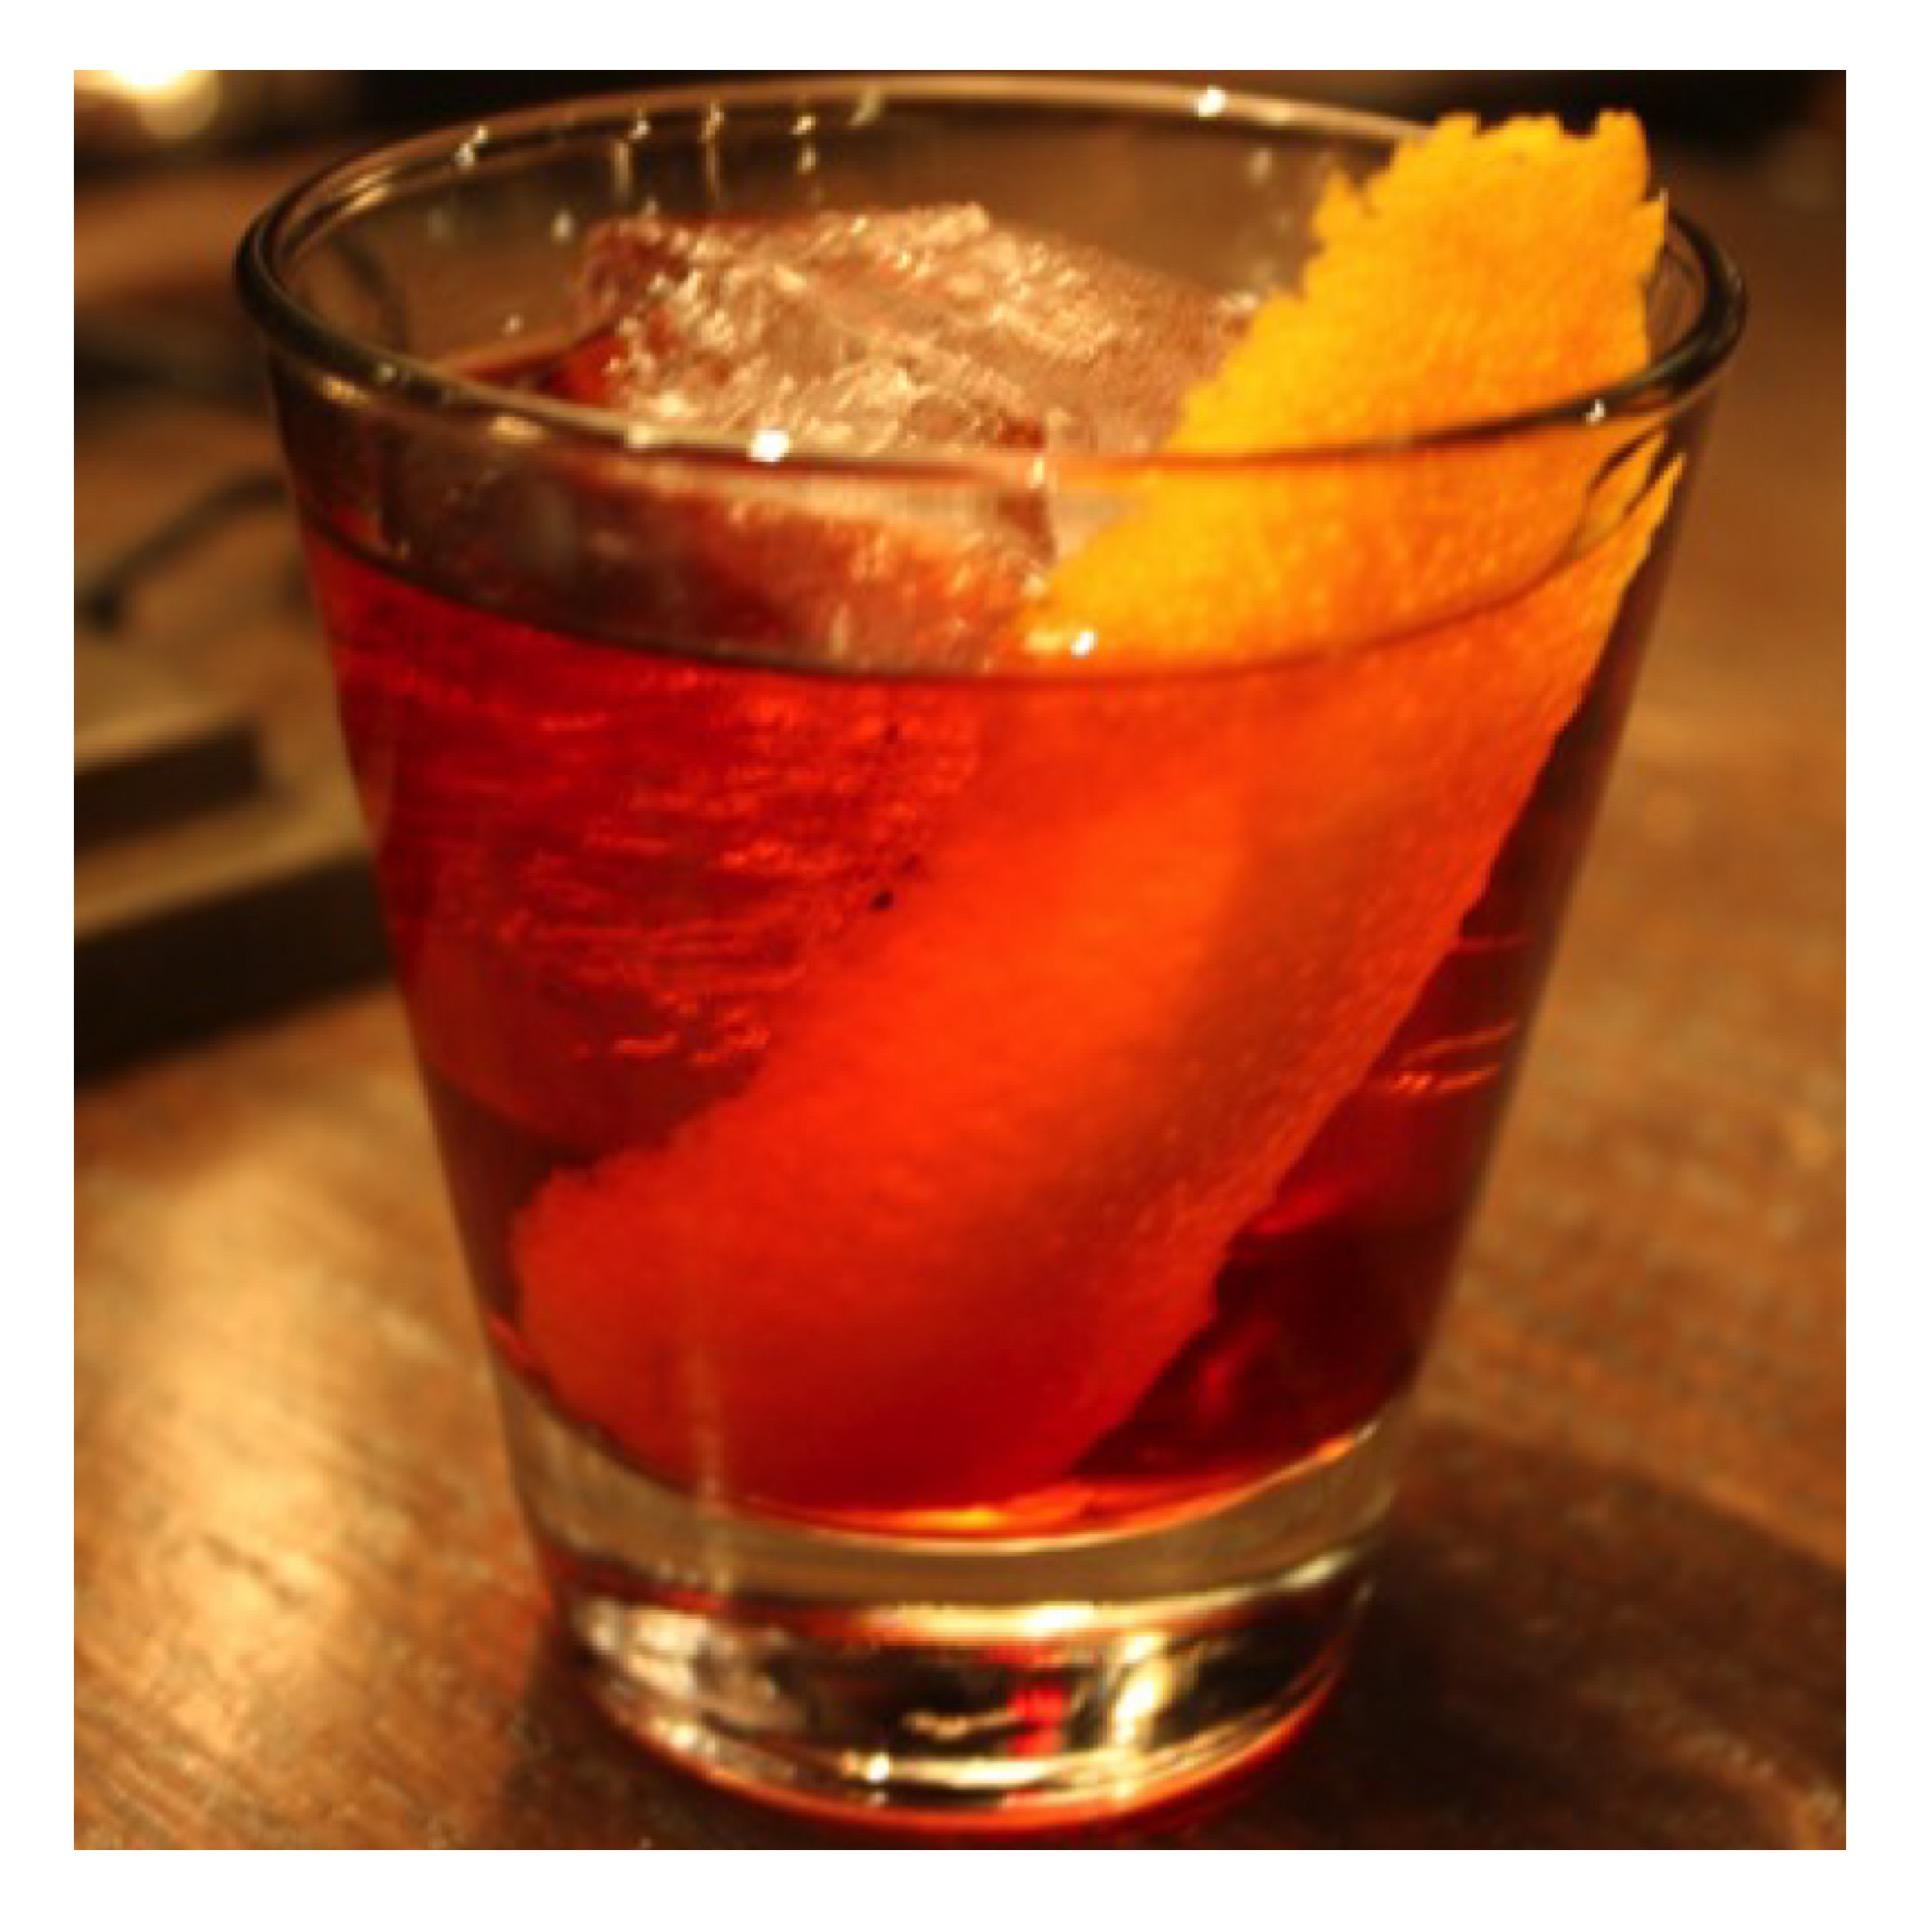 Drifter_Website_Cocktail_Avua_ItalianInRio.jpeg